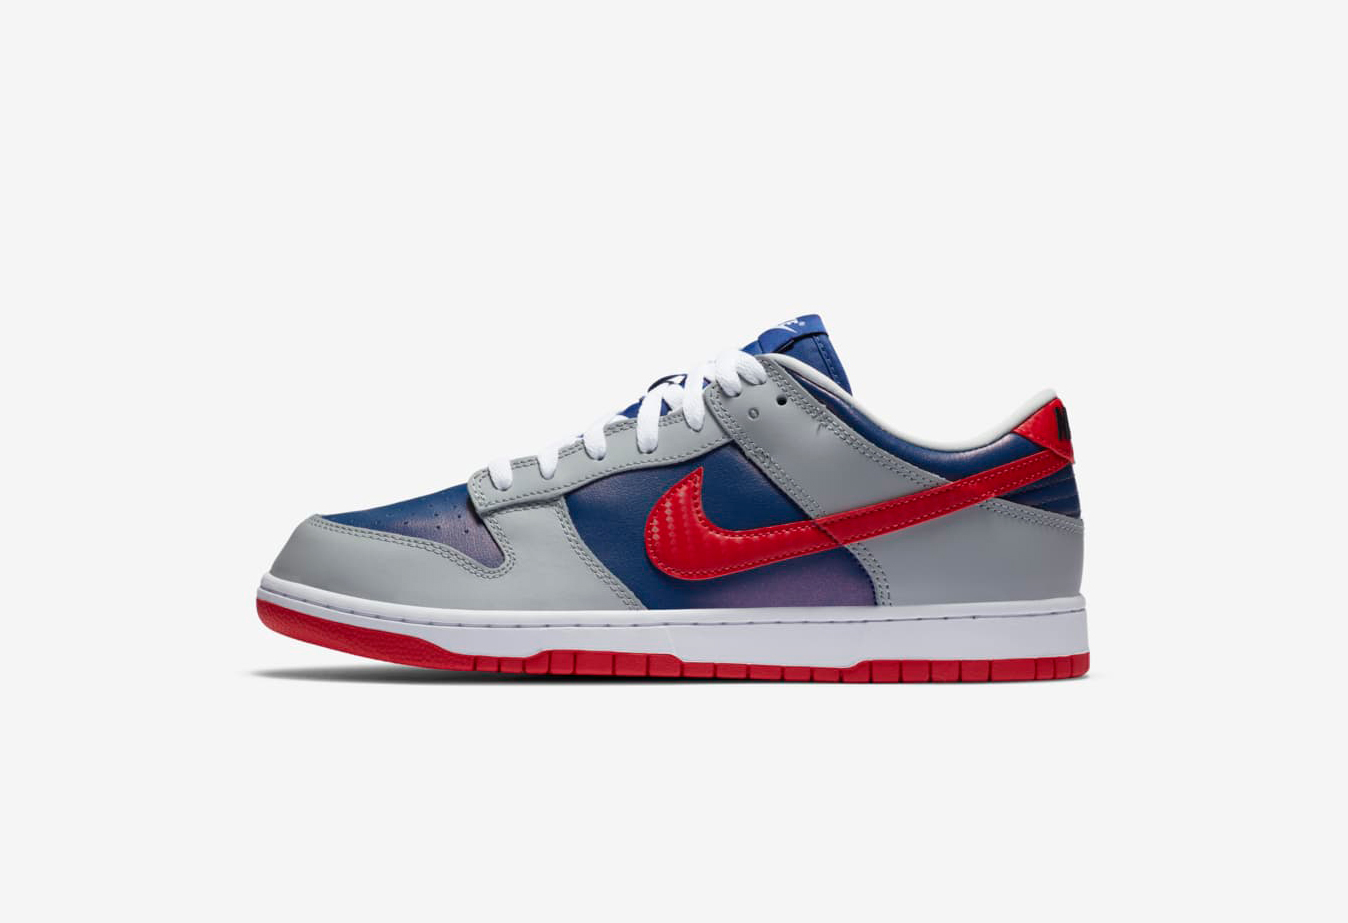 Nike SNRKS 已经上架!奥特曼 Nike Dunk Low 即将发售!